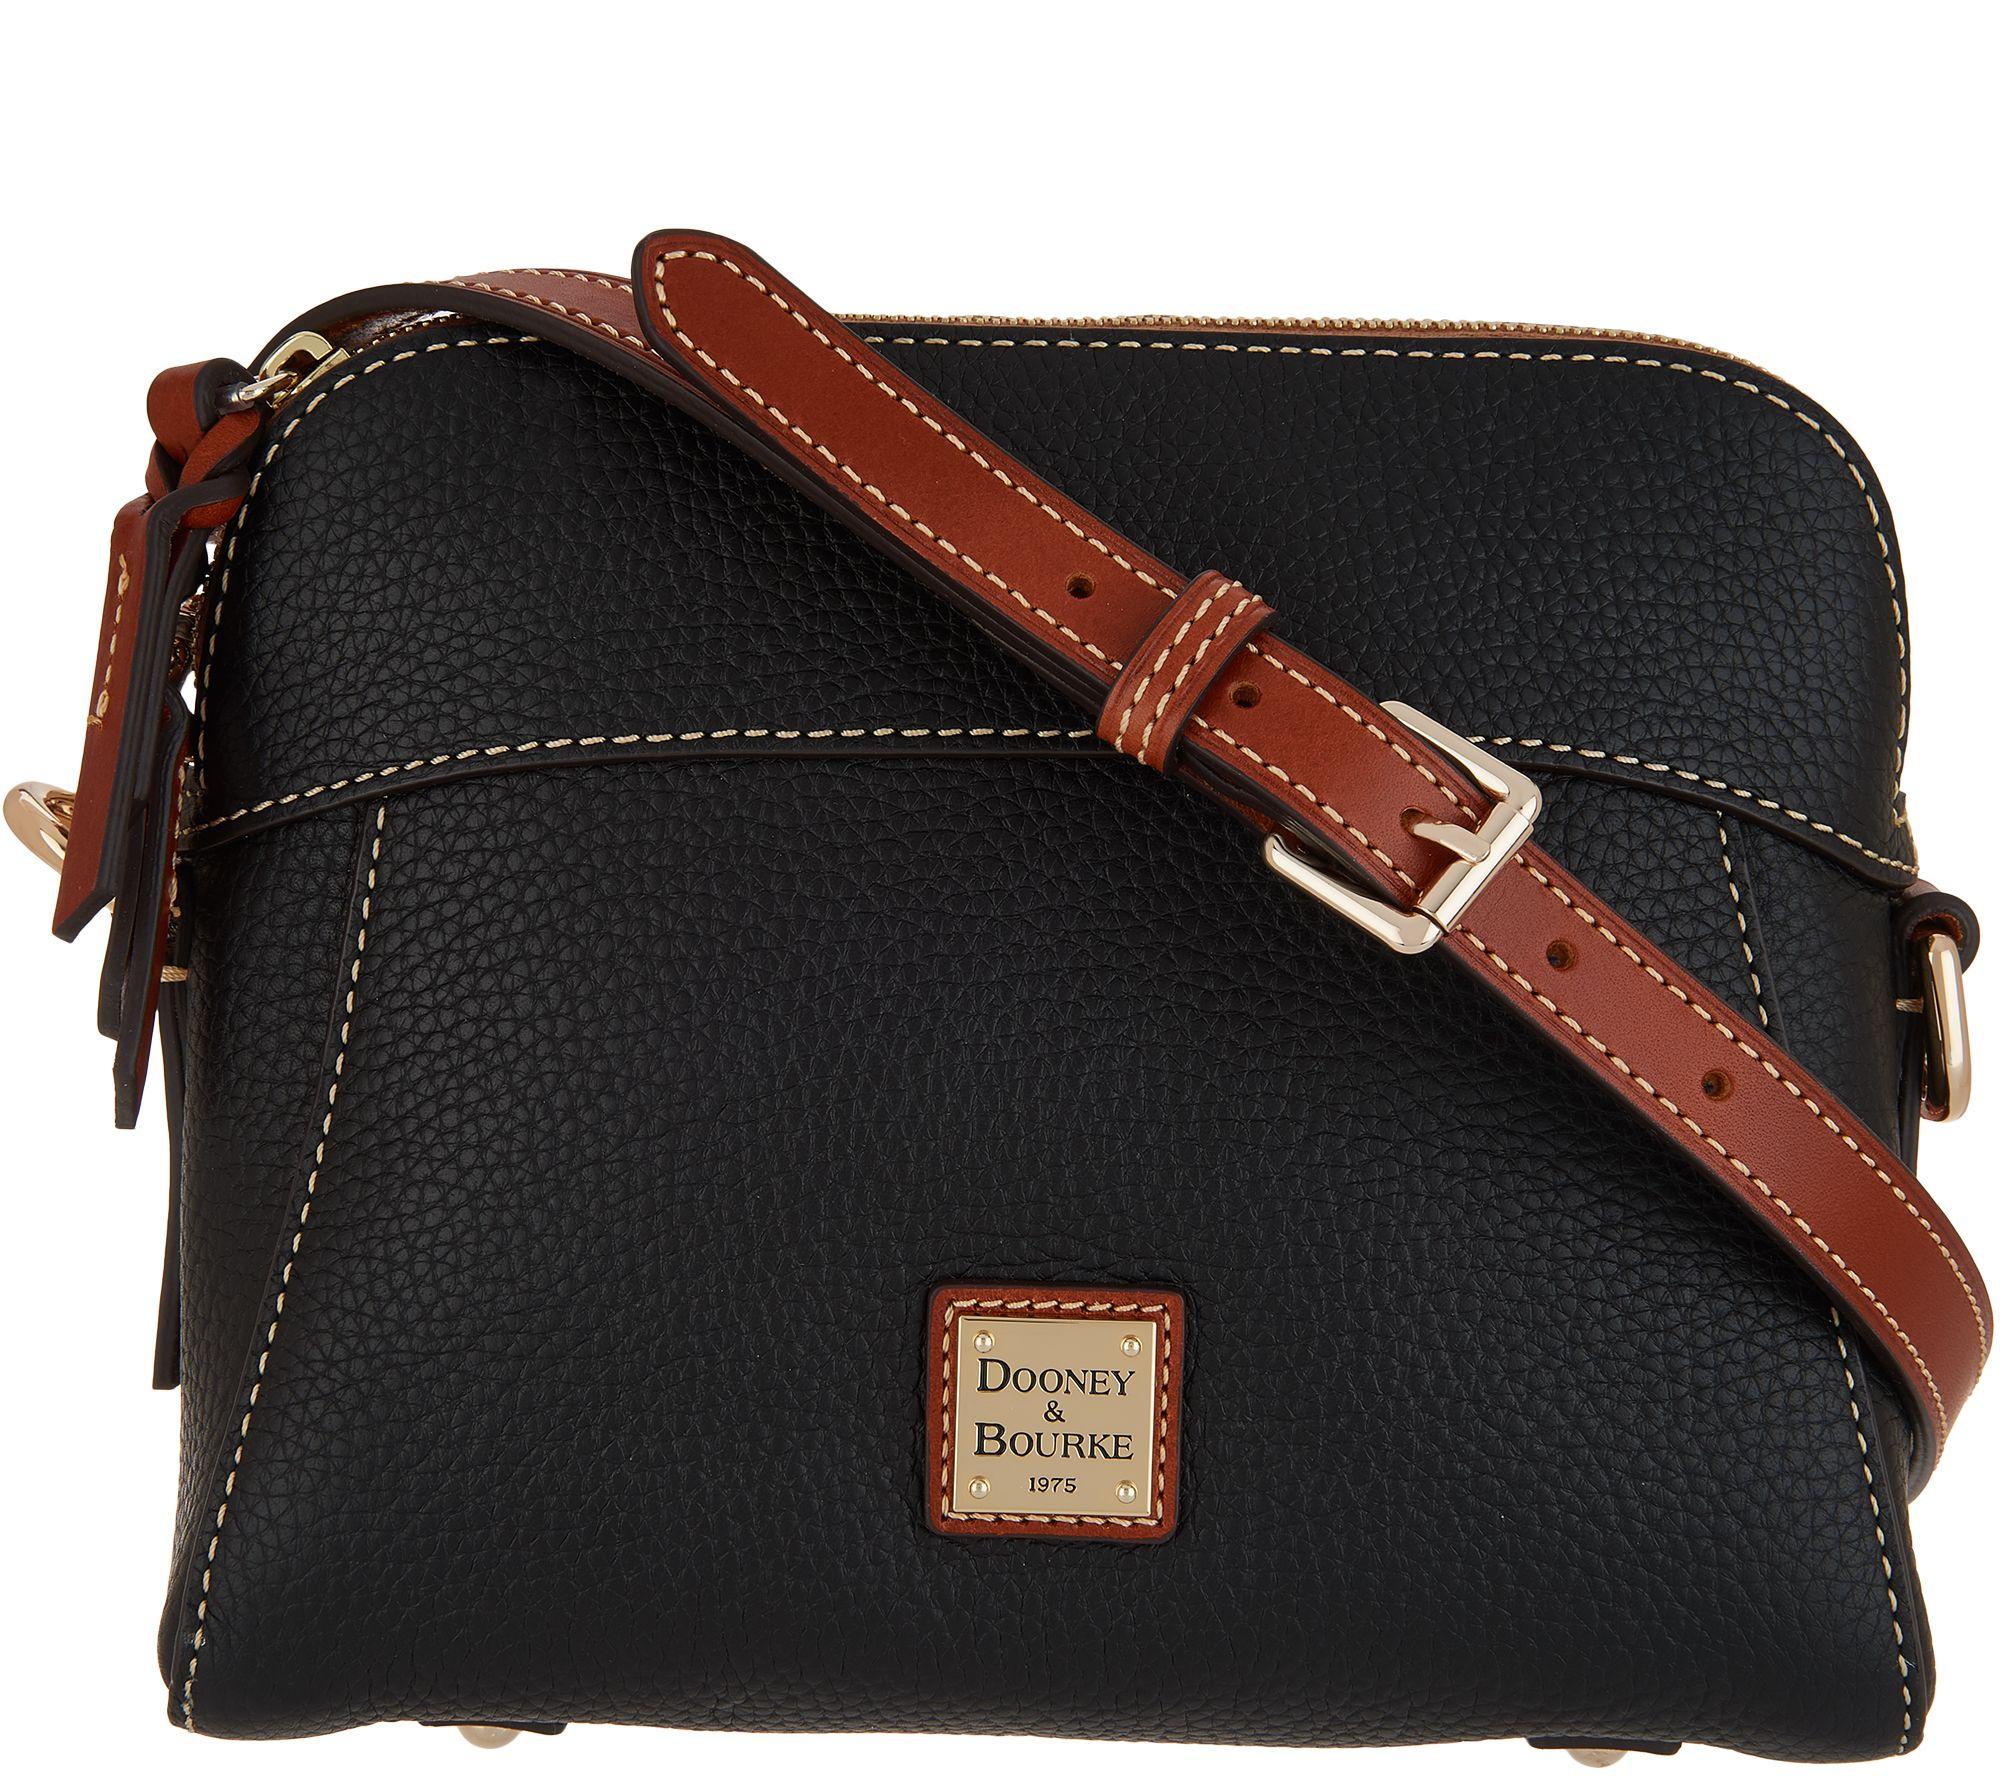 9b9164d8eef1 Dooney   Bourke Pebble Leather Crossbody - Cameron - Page 1 — QVC.com